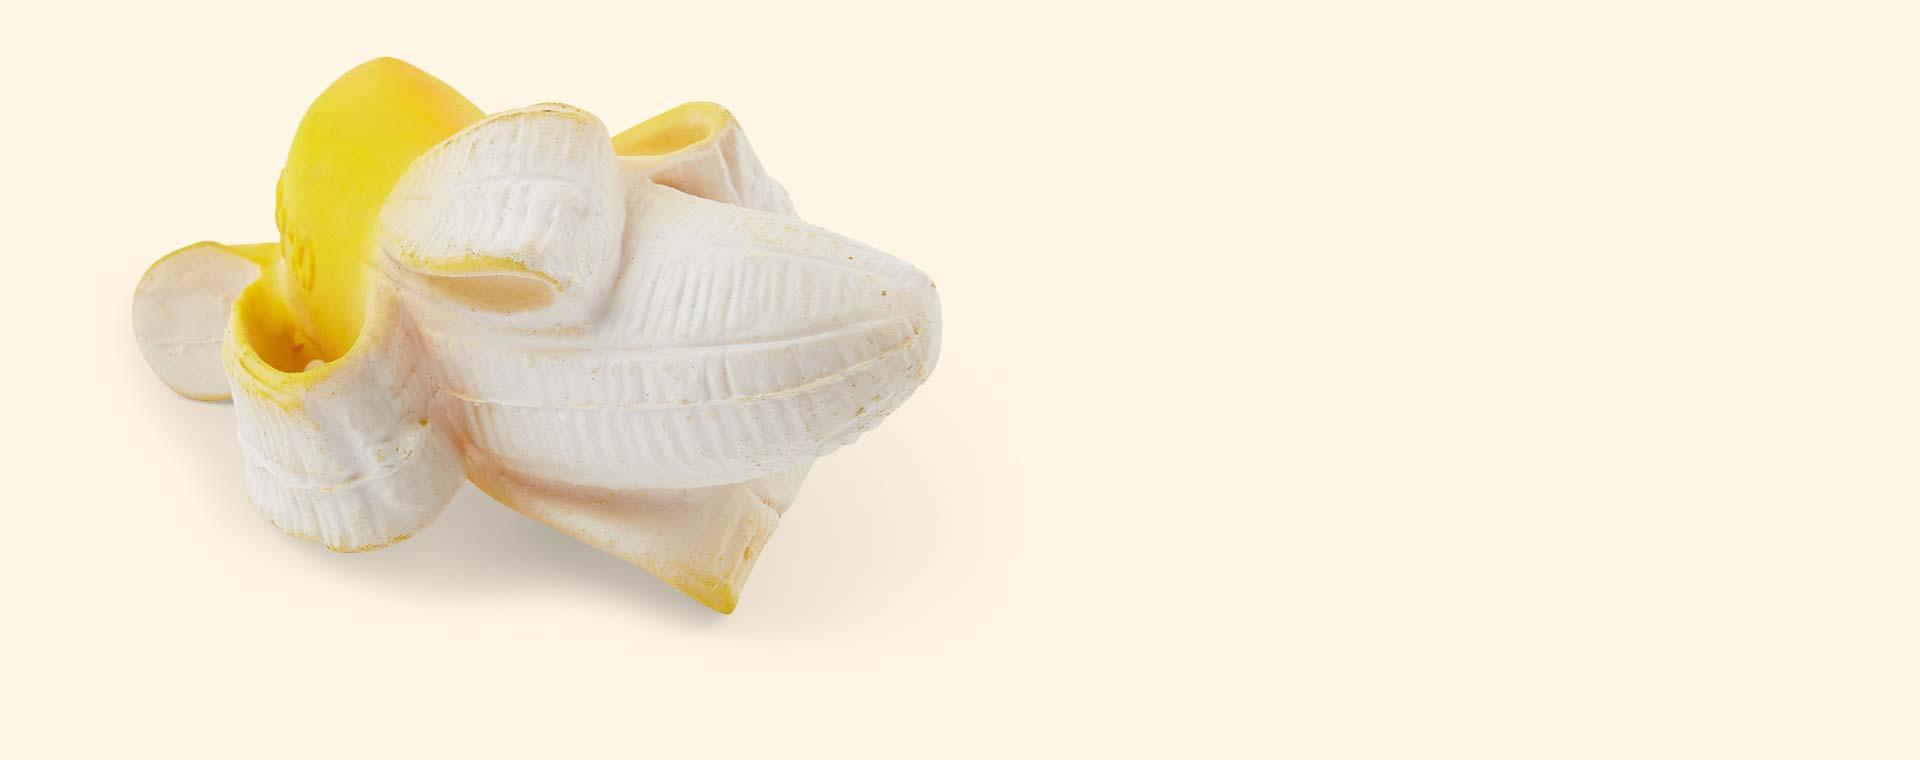 Yellow Oli & Carol Ana Banana Teether